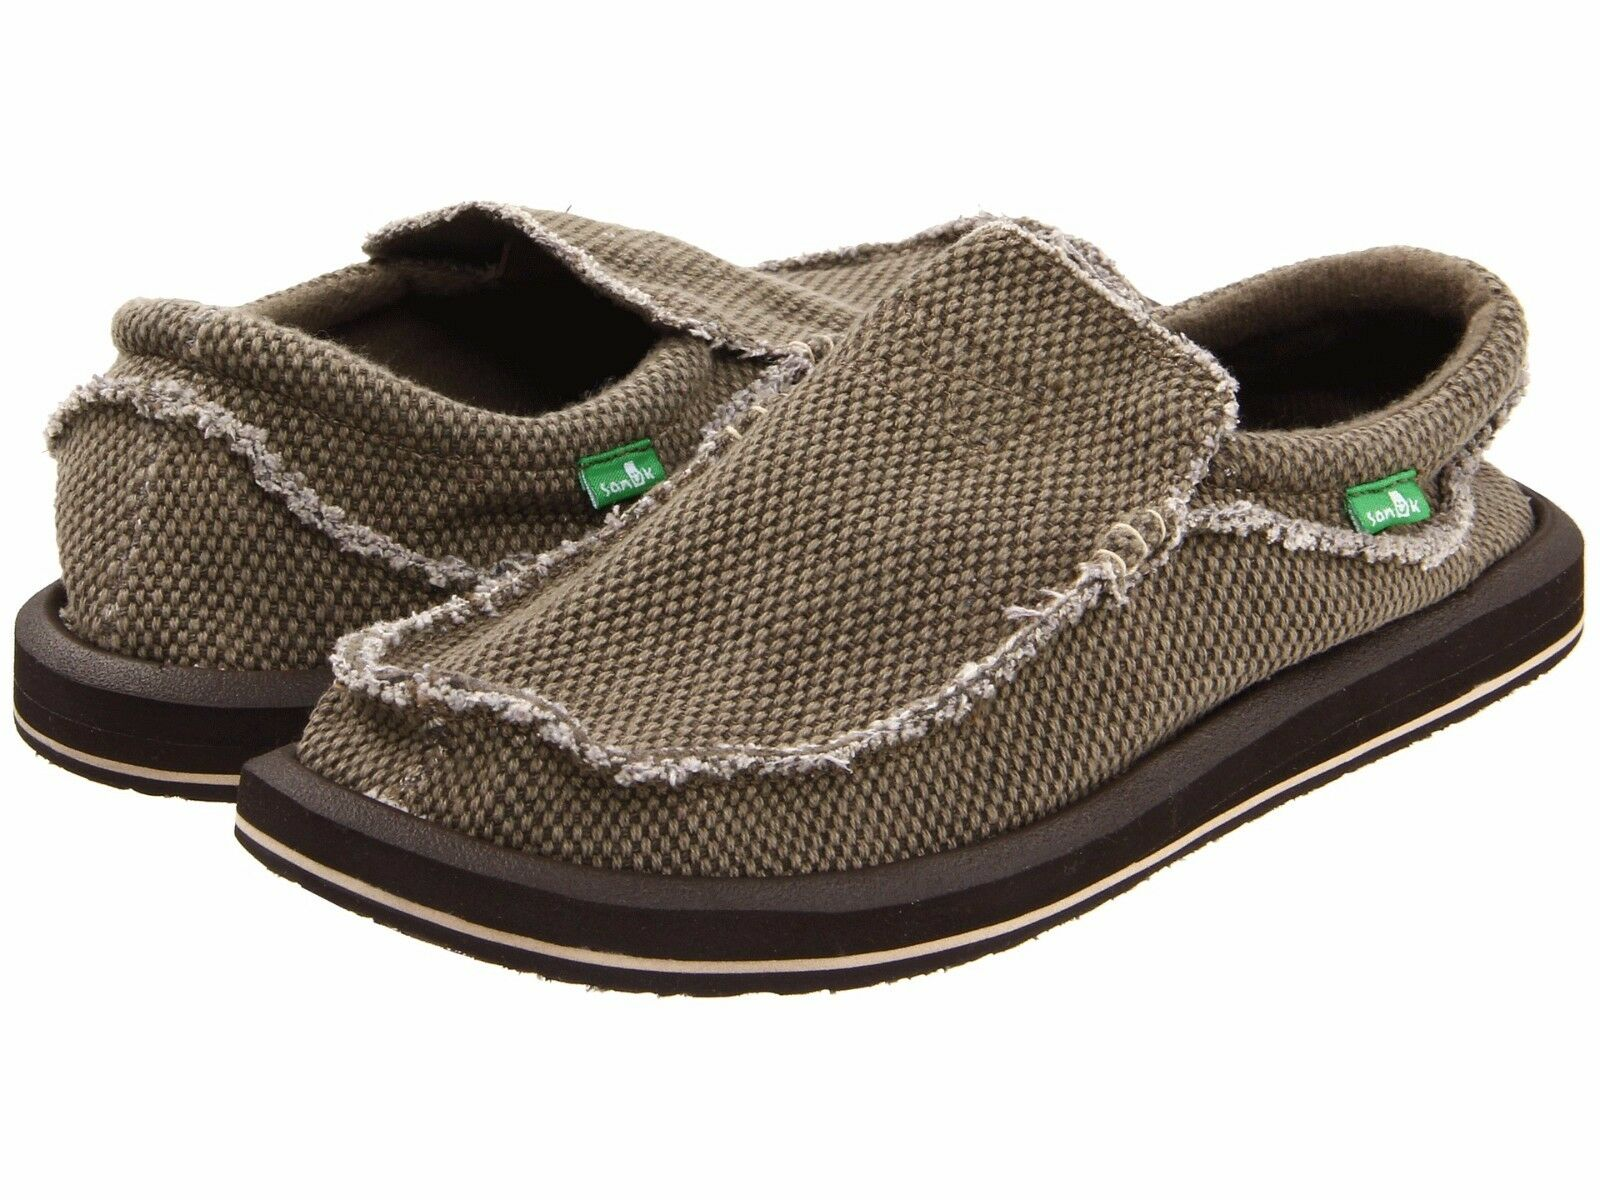 Men's Shoes Sanuk Chiba Slip On Sidewalk Surfers SMF1047 Brown *New*